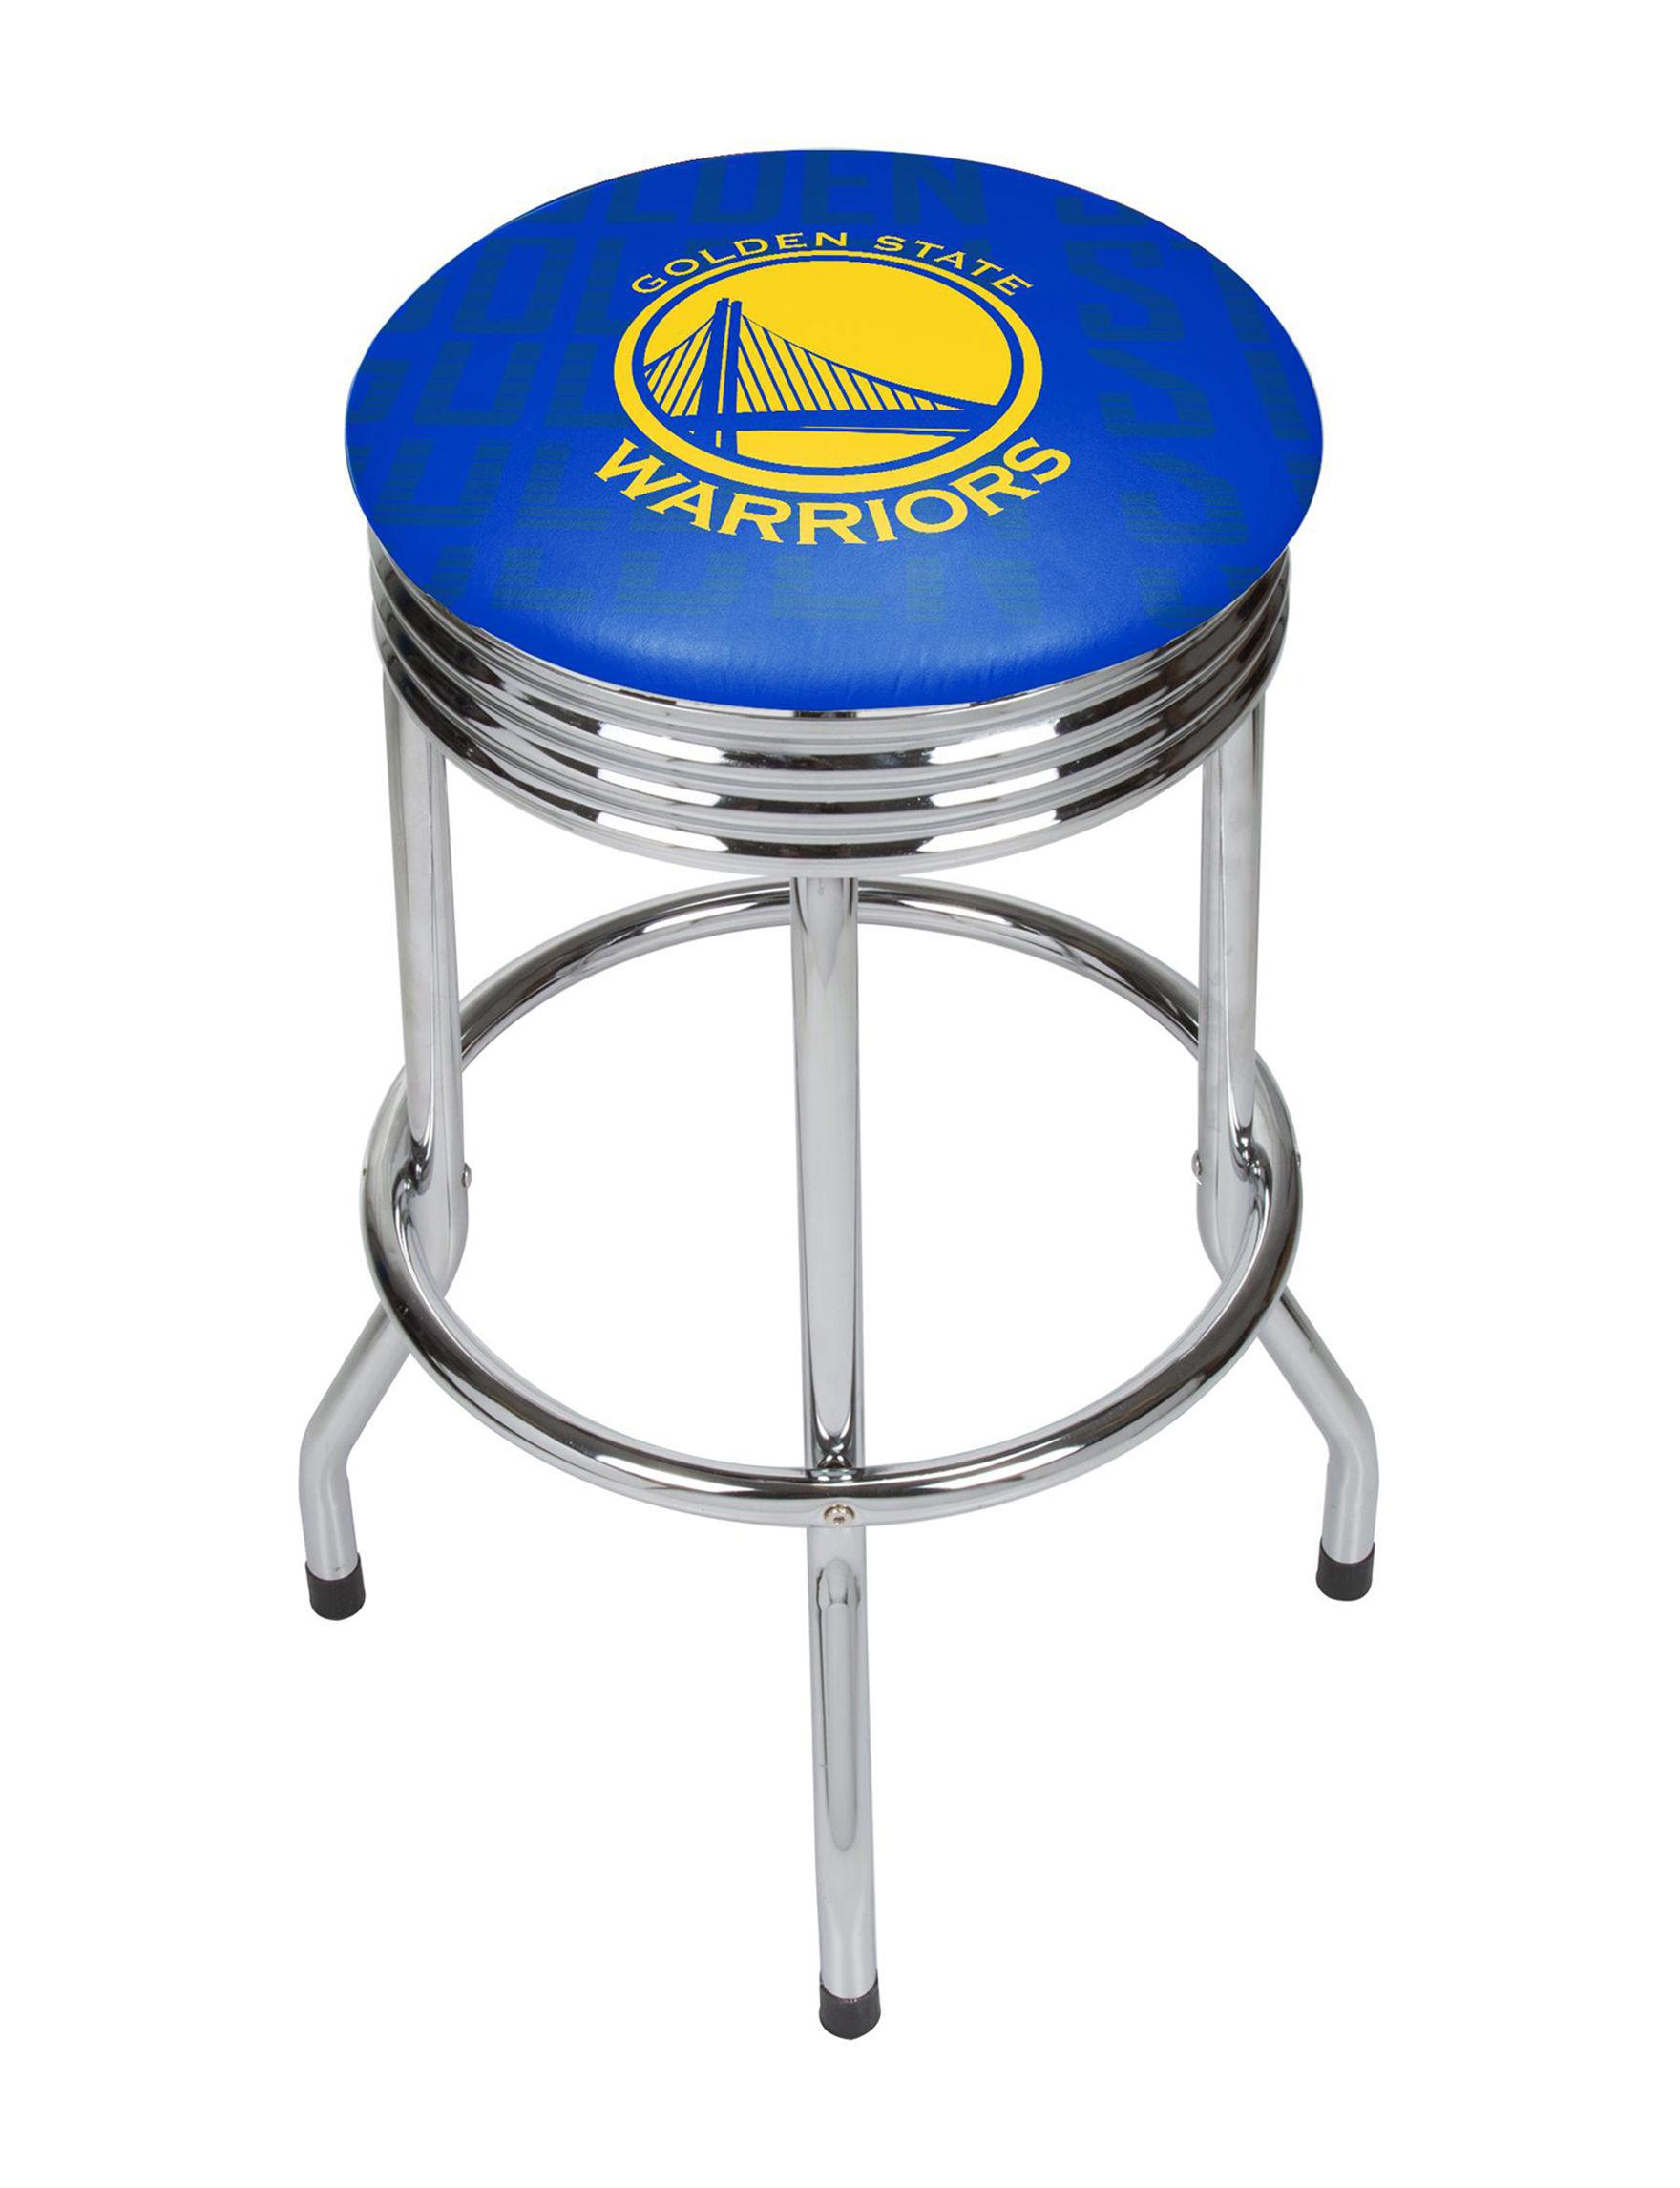 Golden State Warriors Basketball Club Ribbed Bar Stool